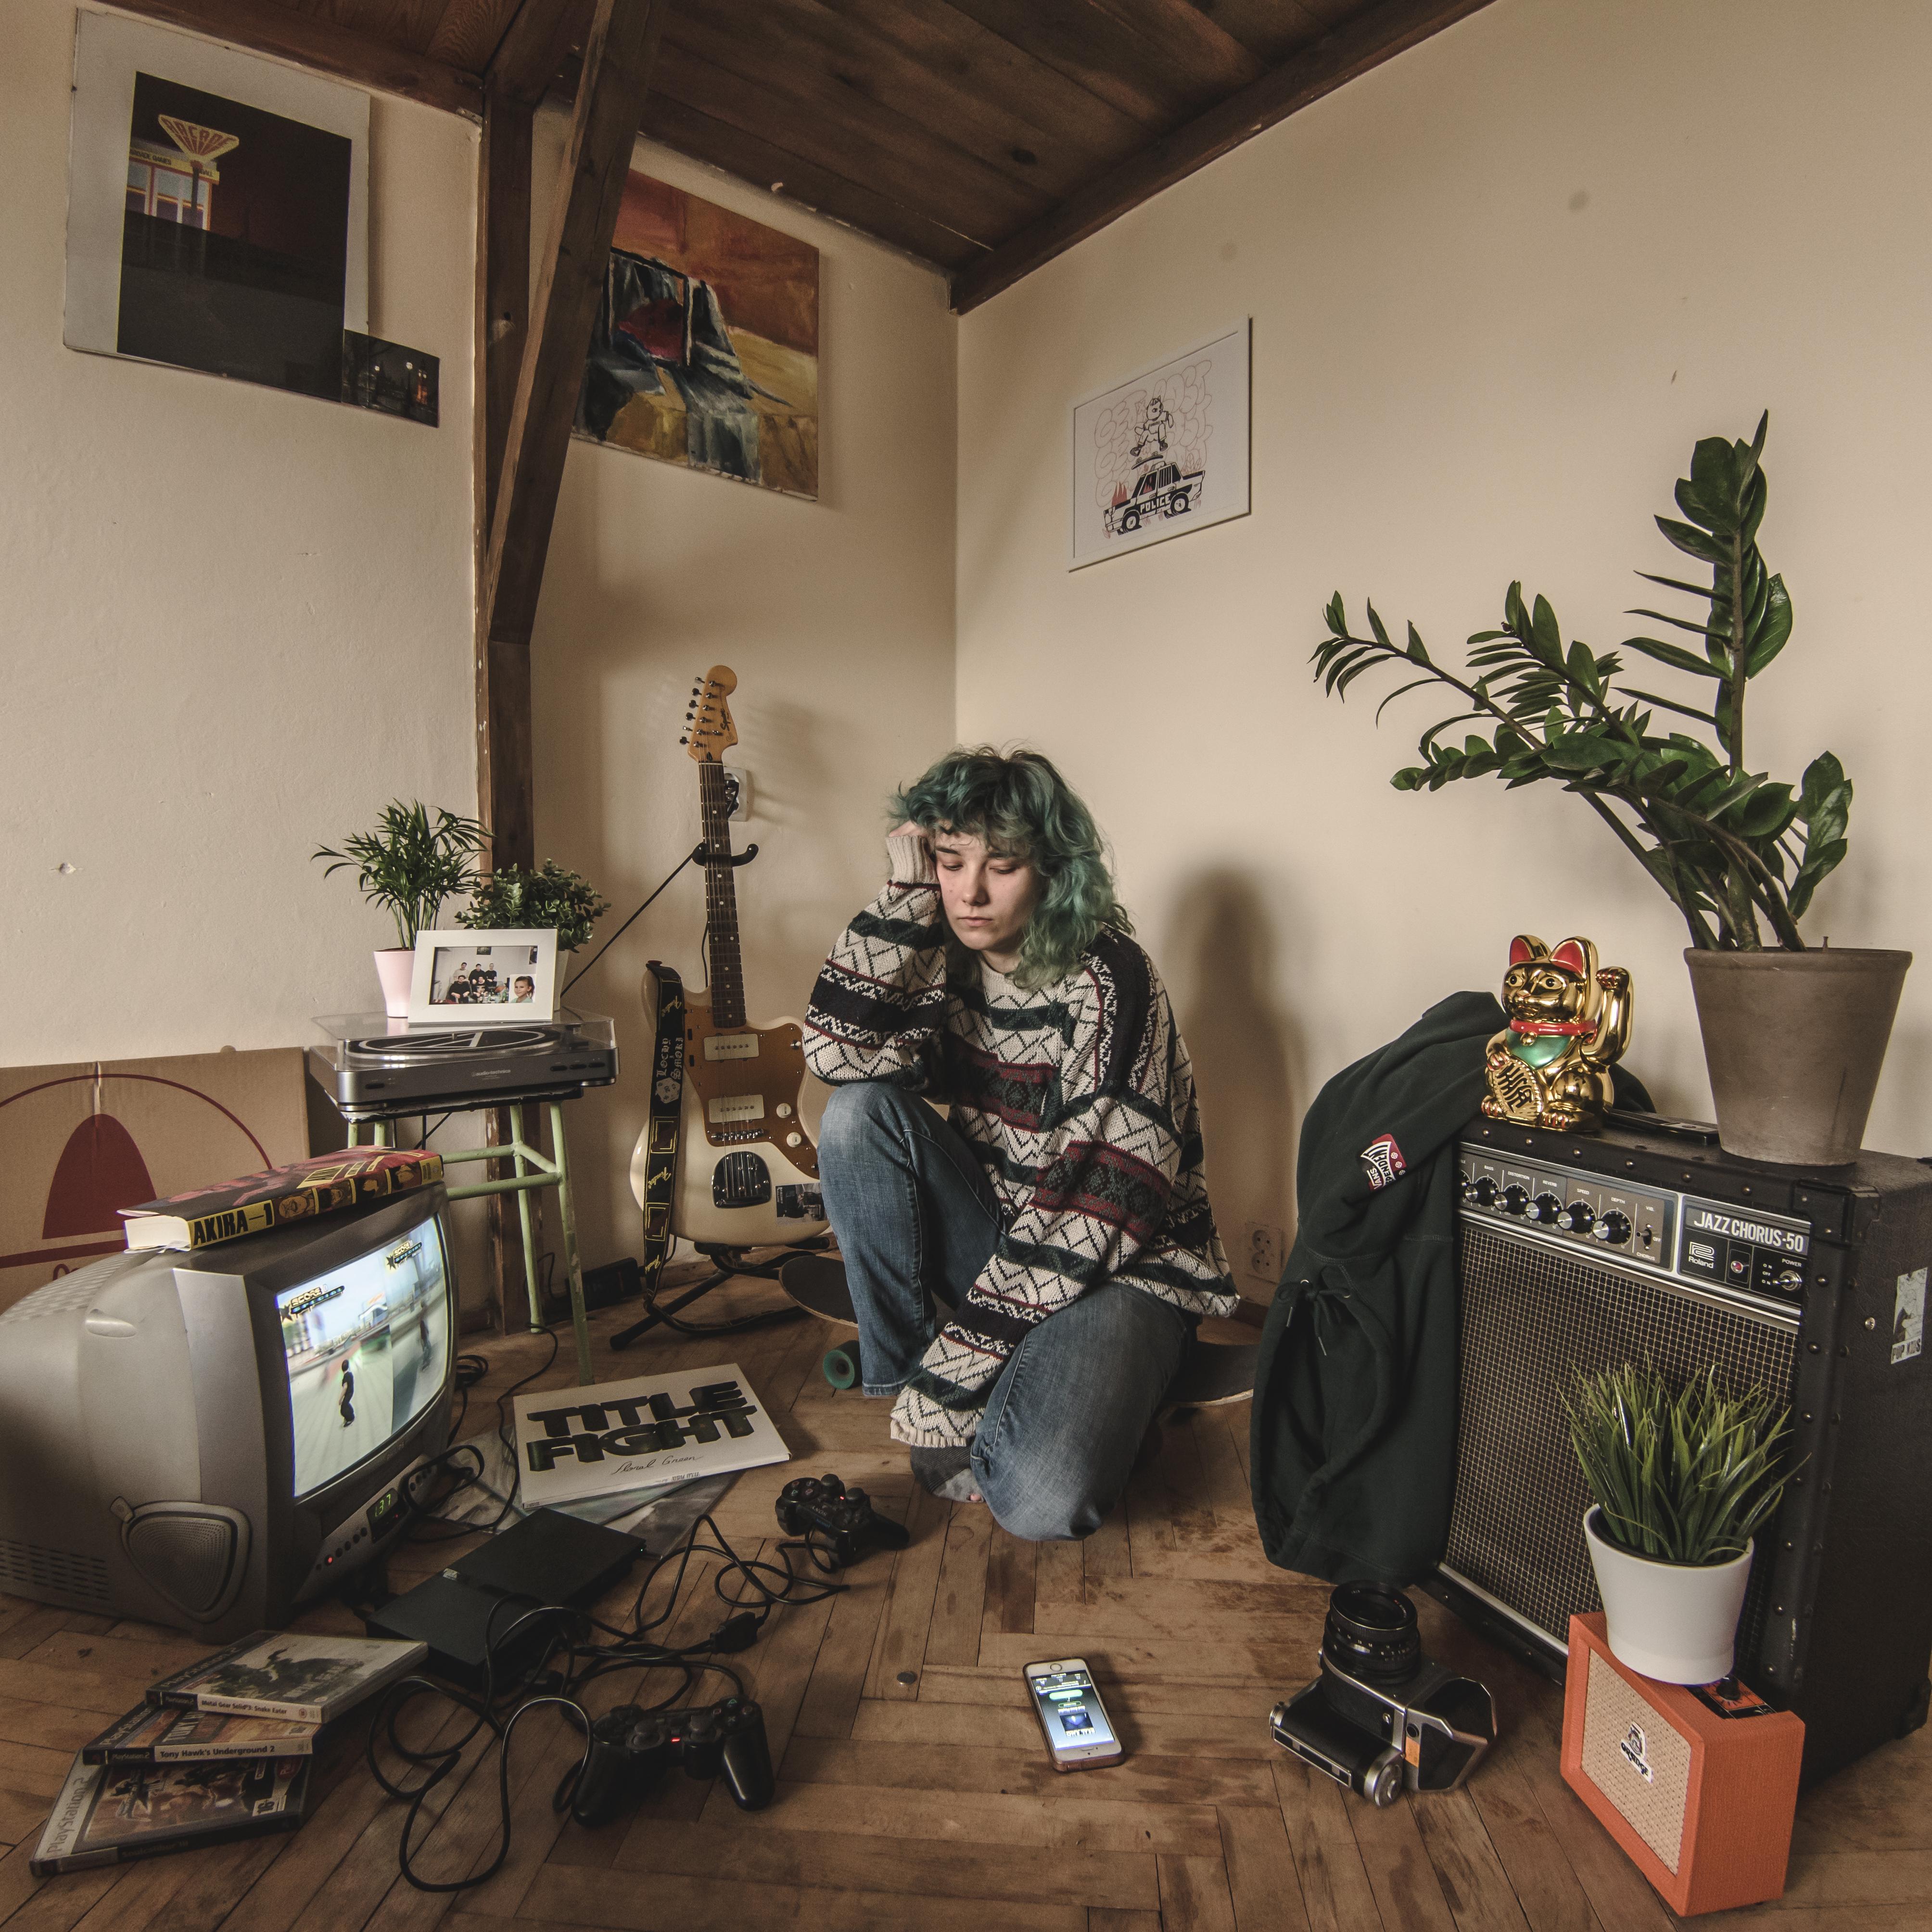 Syndrom Paryski - Małe Pokoje w Dużym Mieście CD